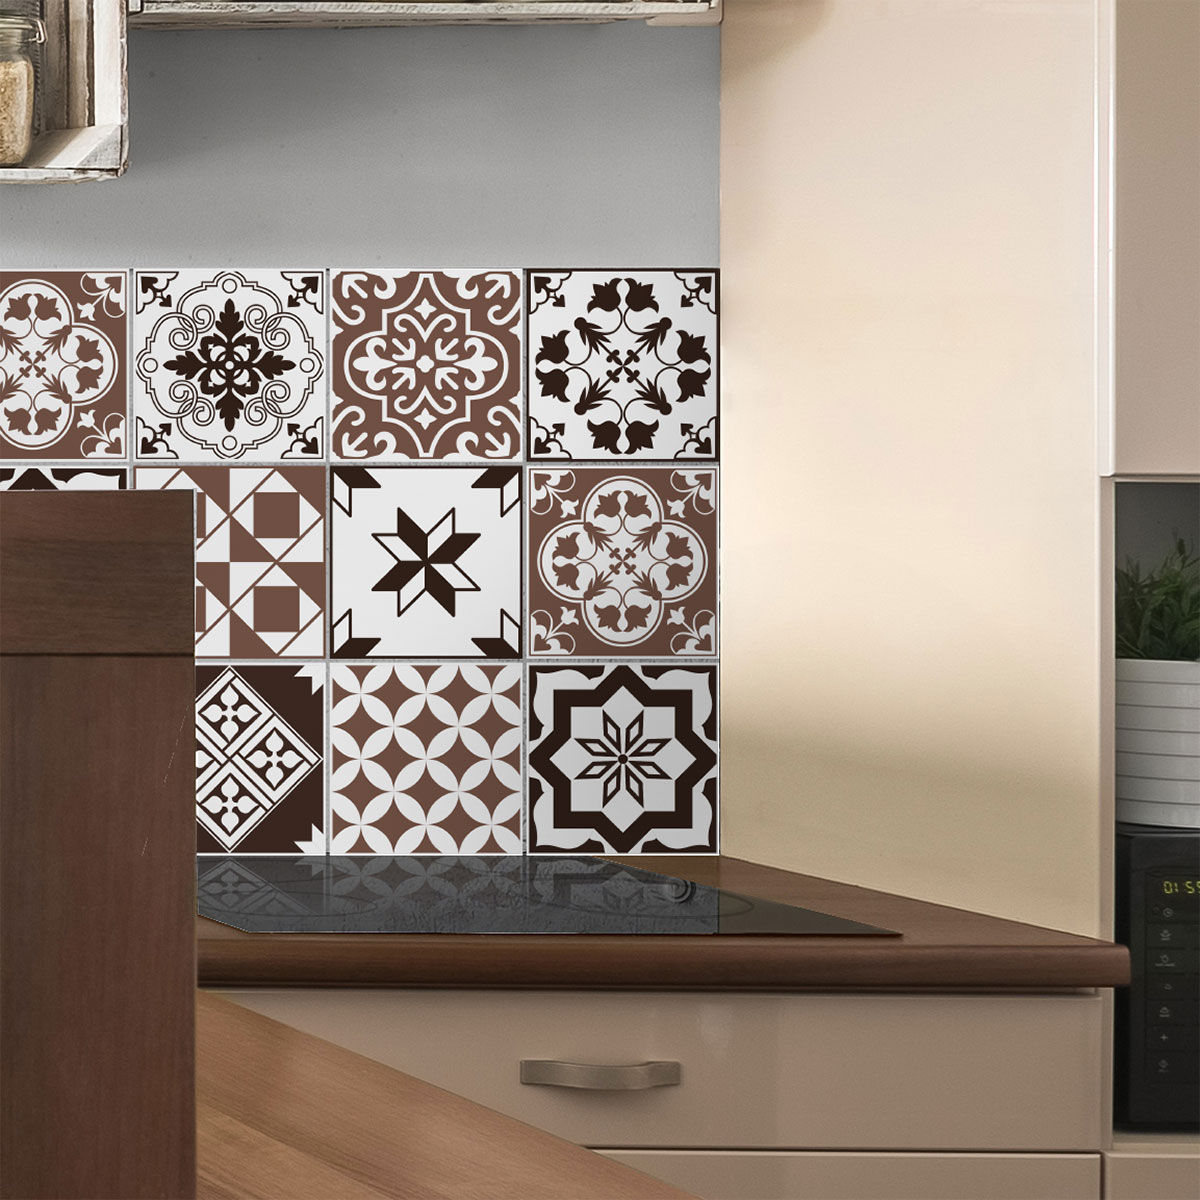 9 stickers carreaux de ciment azulejos eurasio cuisine carrelages ambiance sticker. Black Bedroom Furniture Sets. Home Design Ideas